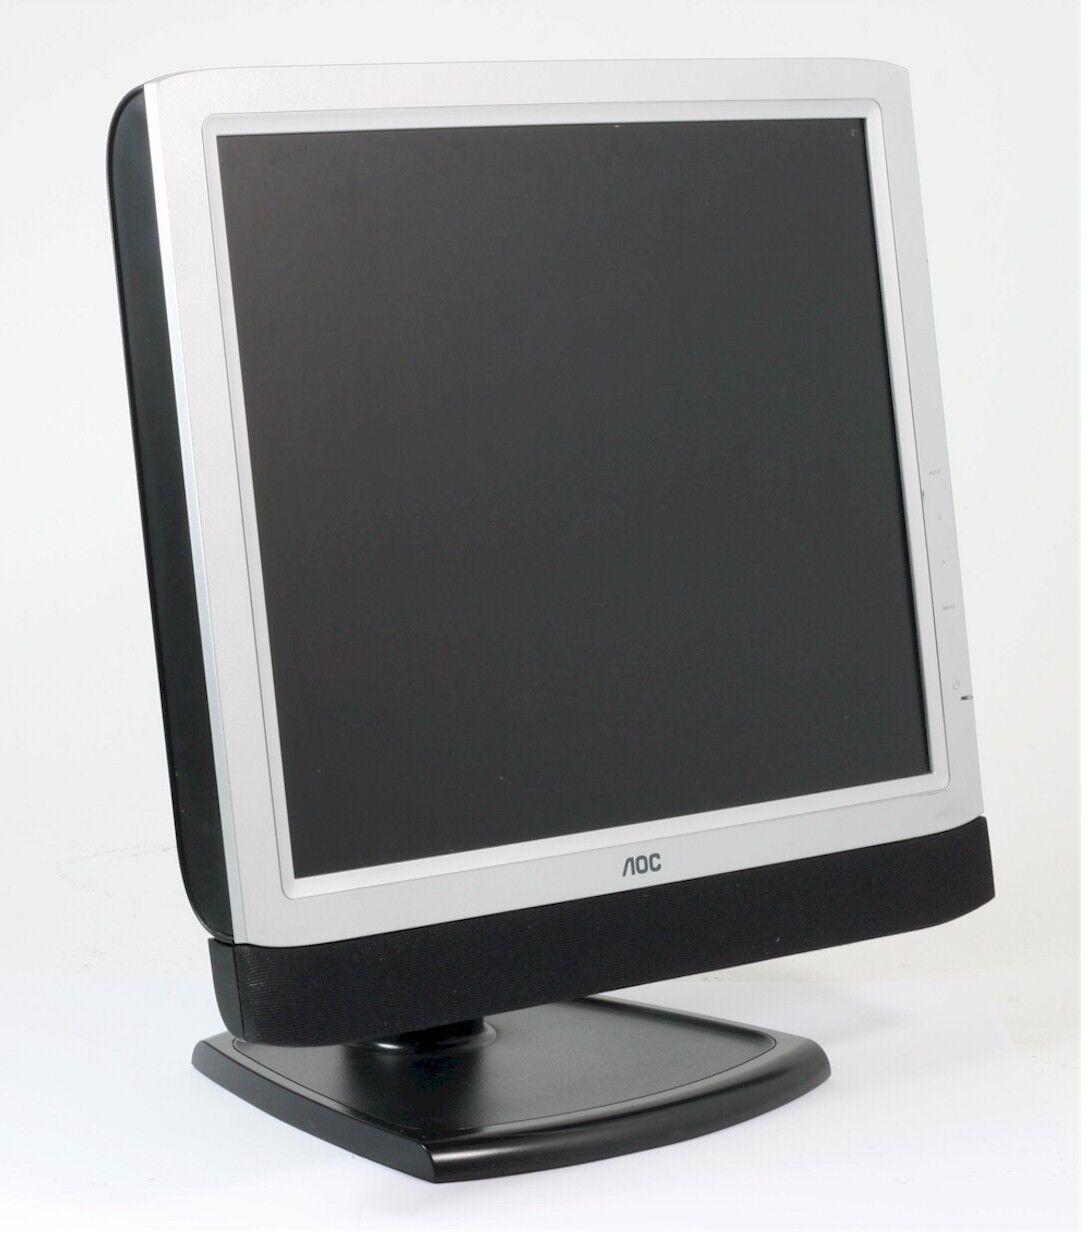 AOC LM929 Bildschirm 19 Zoll Monitor 48,3 cm LCD Flachbildschirm TFT 19